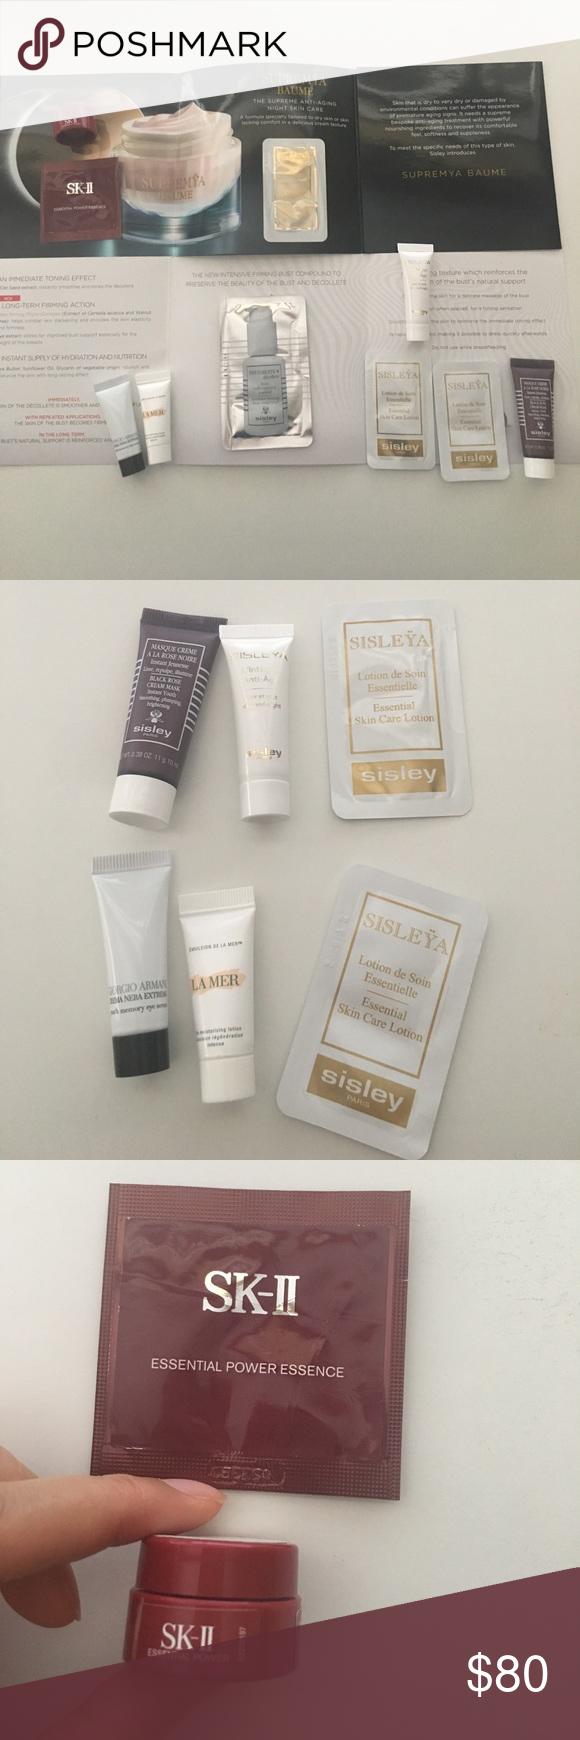 Luxury Skin Care Sample 10 Pieces Sisley La Mer Sisleya Anti Age 4ml Value 42 Sisley Black Rose Cream M Luxury Skincare Skincare Samples Skin Care Essentials